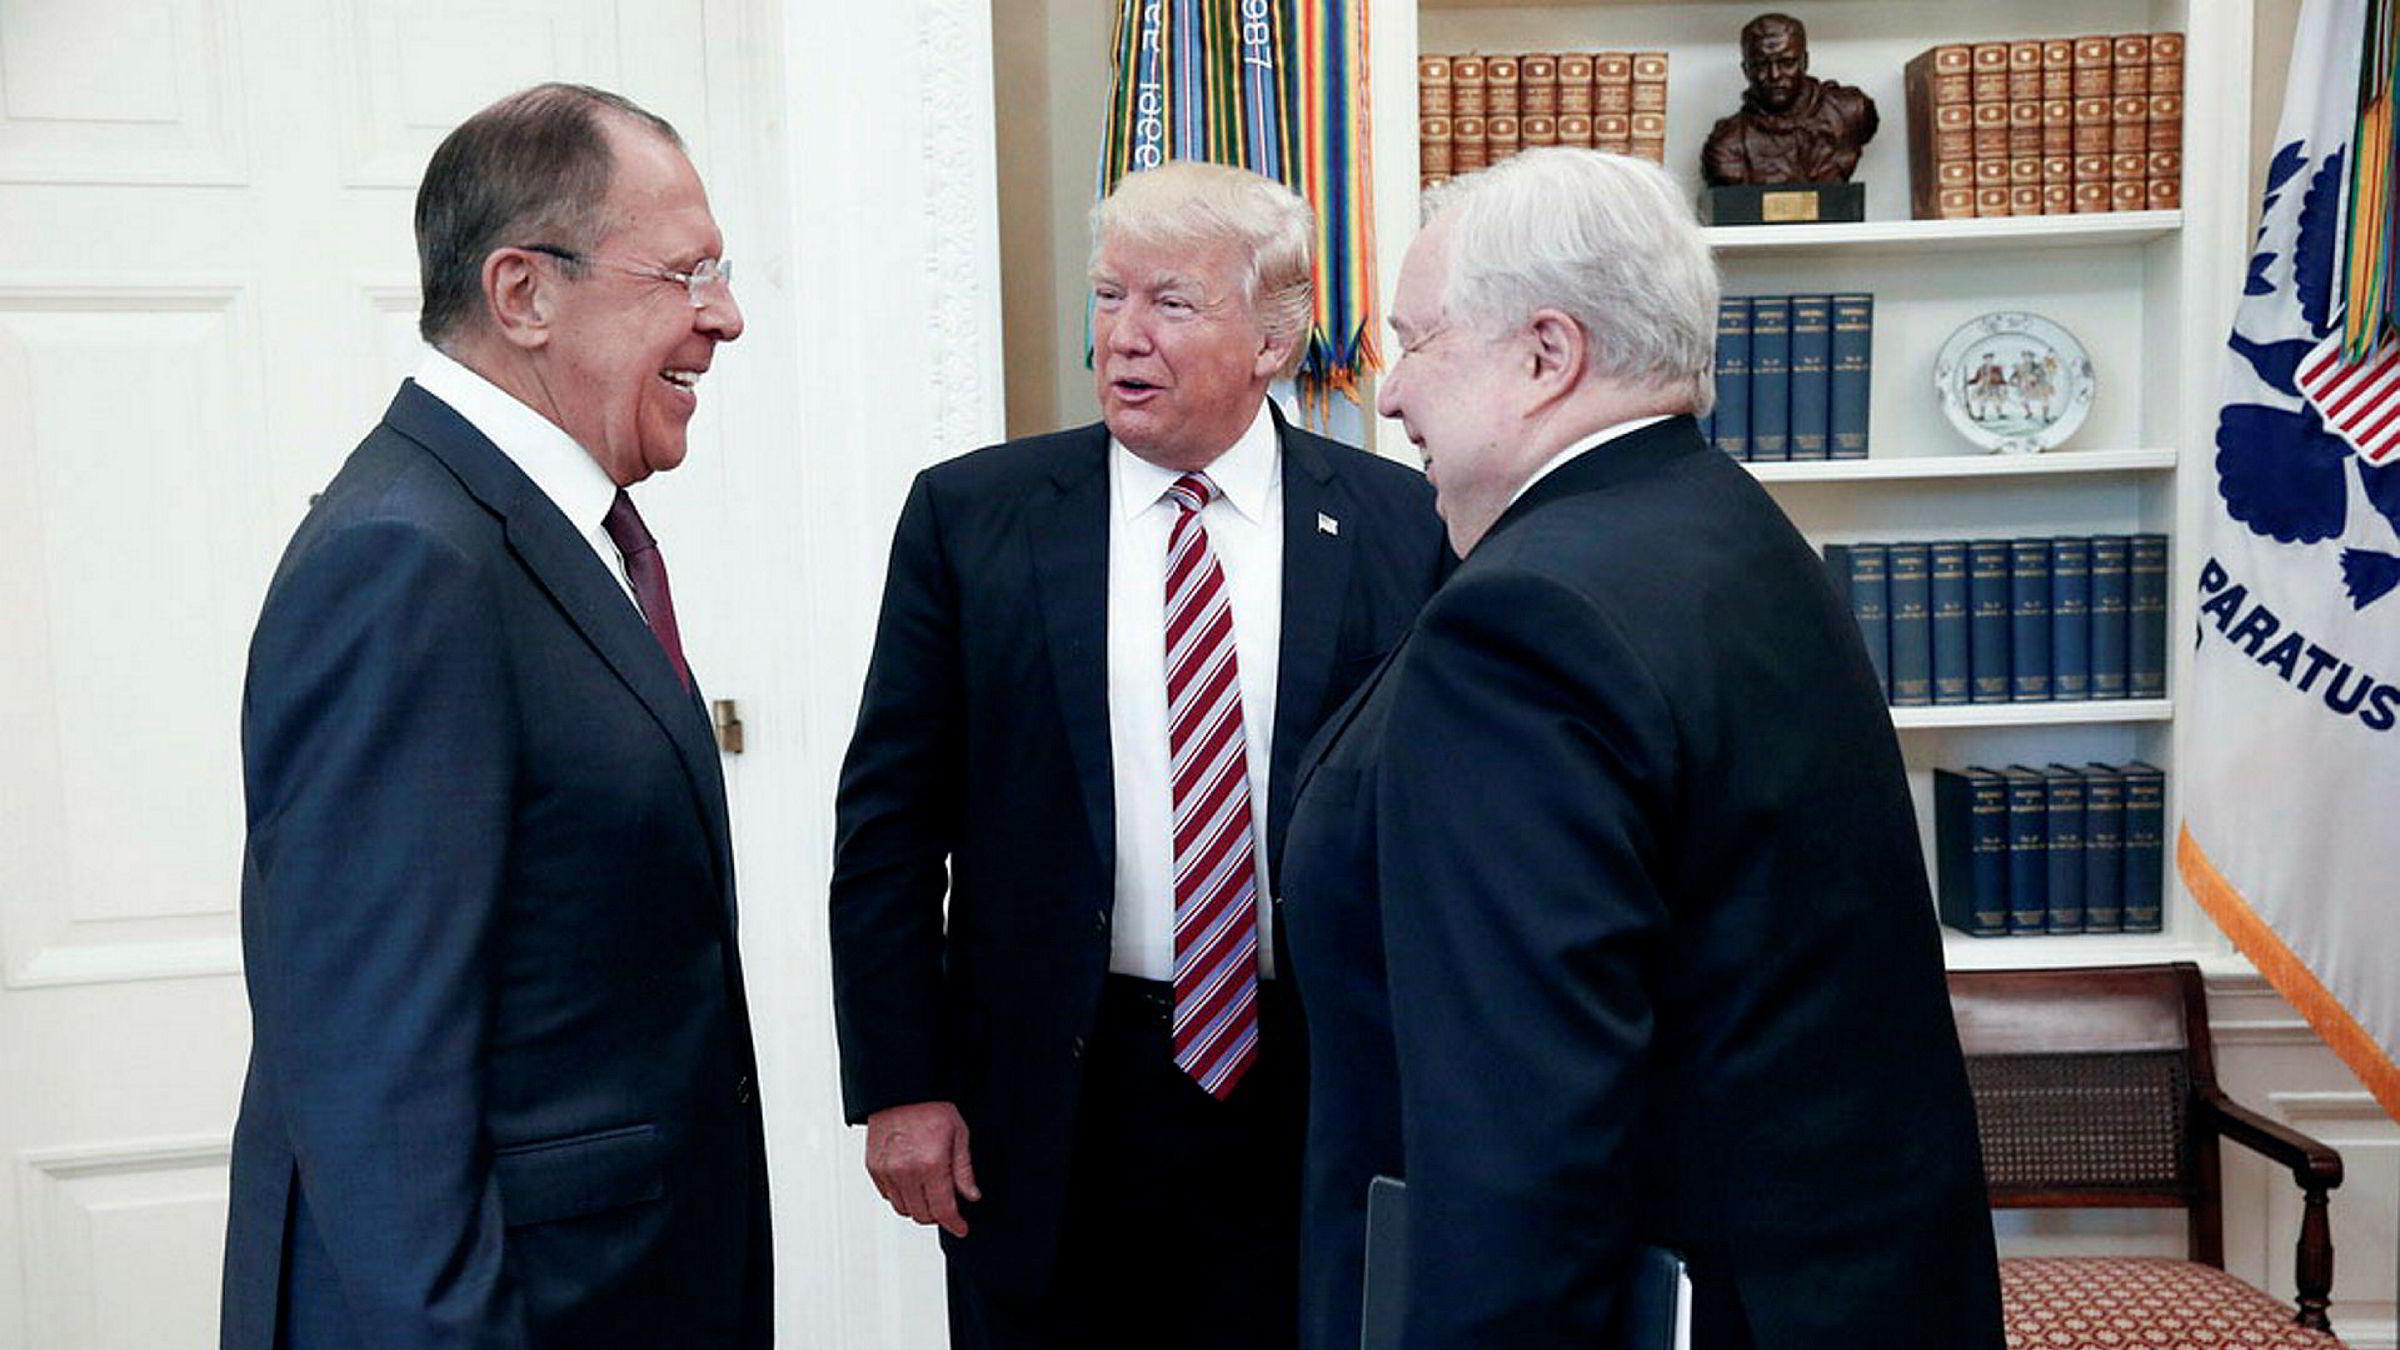 Russlands utenriksminister Sergej Lavrov (til venstre) var strålende fornøyd da han onsdag møtte Donald Trump. Til høyre, Sergey Kislyak, Russlands omstridte ambassadør i Washington, som hadde kontakt med den nå sparkede nasjonale sikkerhetsrådgiveren Michael Flynn.